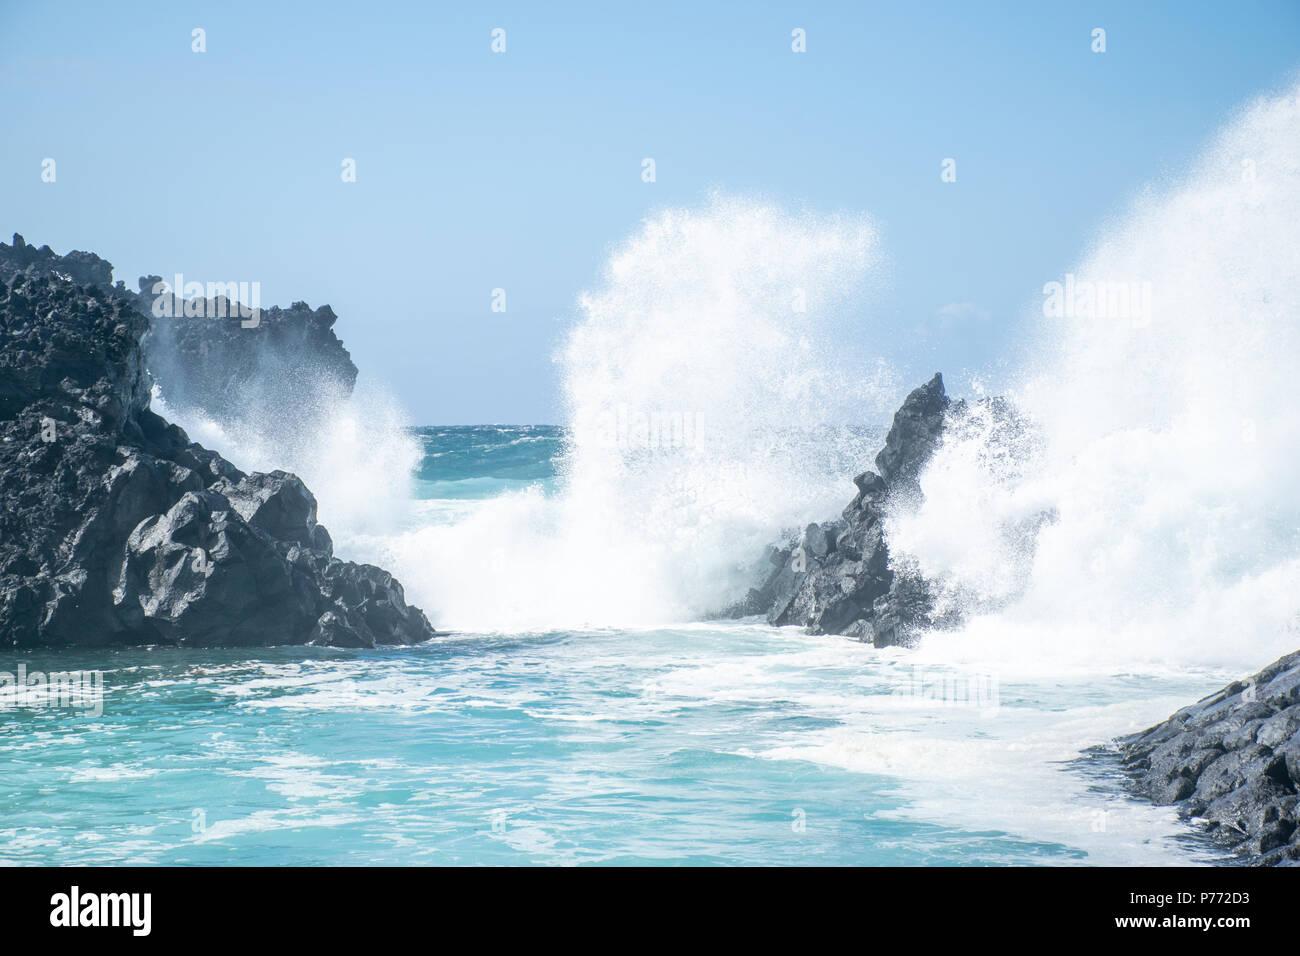 Ocean crashing on the rocks - Stock Image